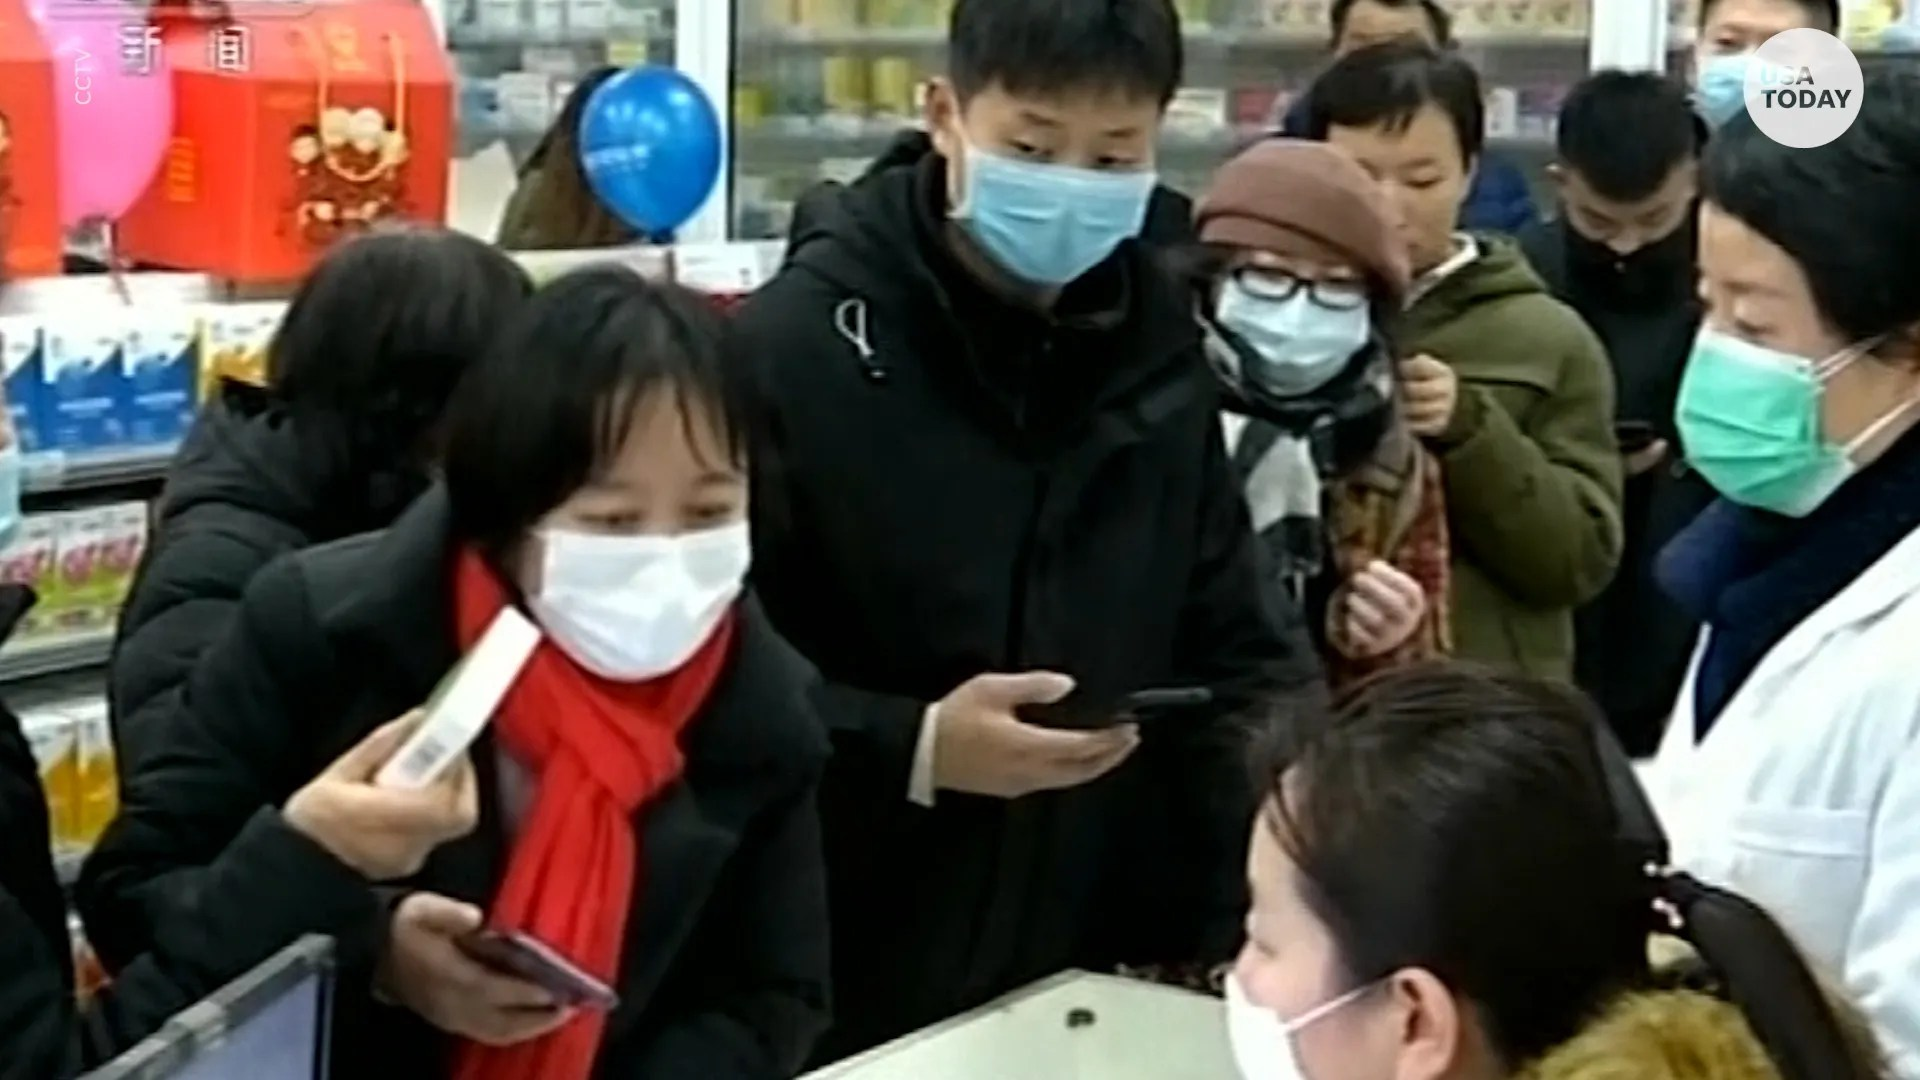 Wuhan coronavirus: Bogus conspiracy theory spreads on social media